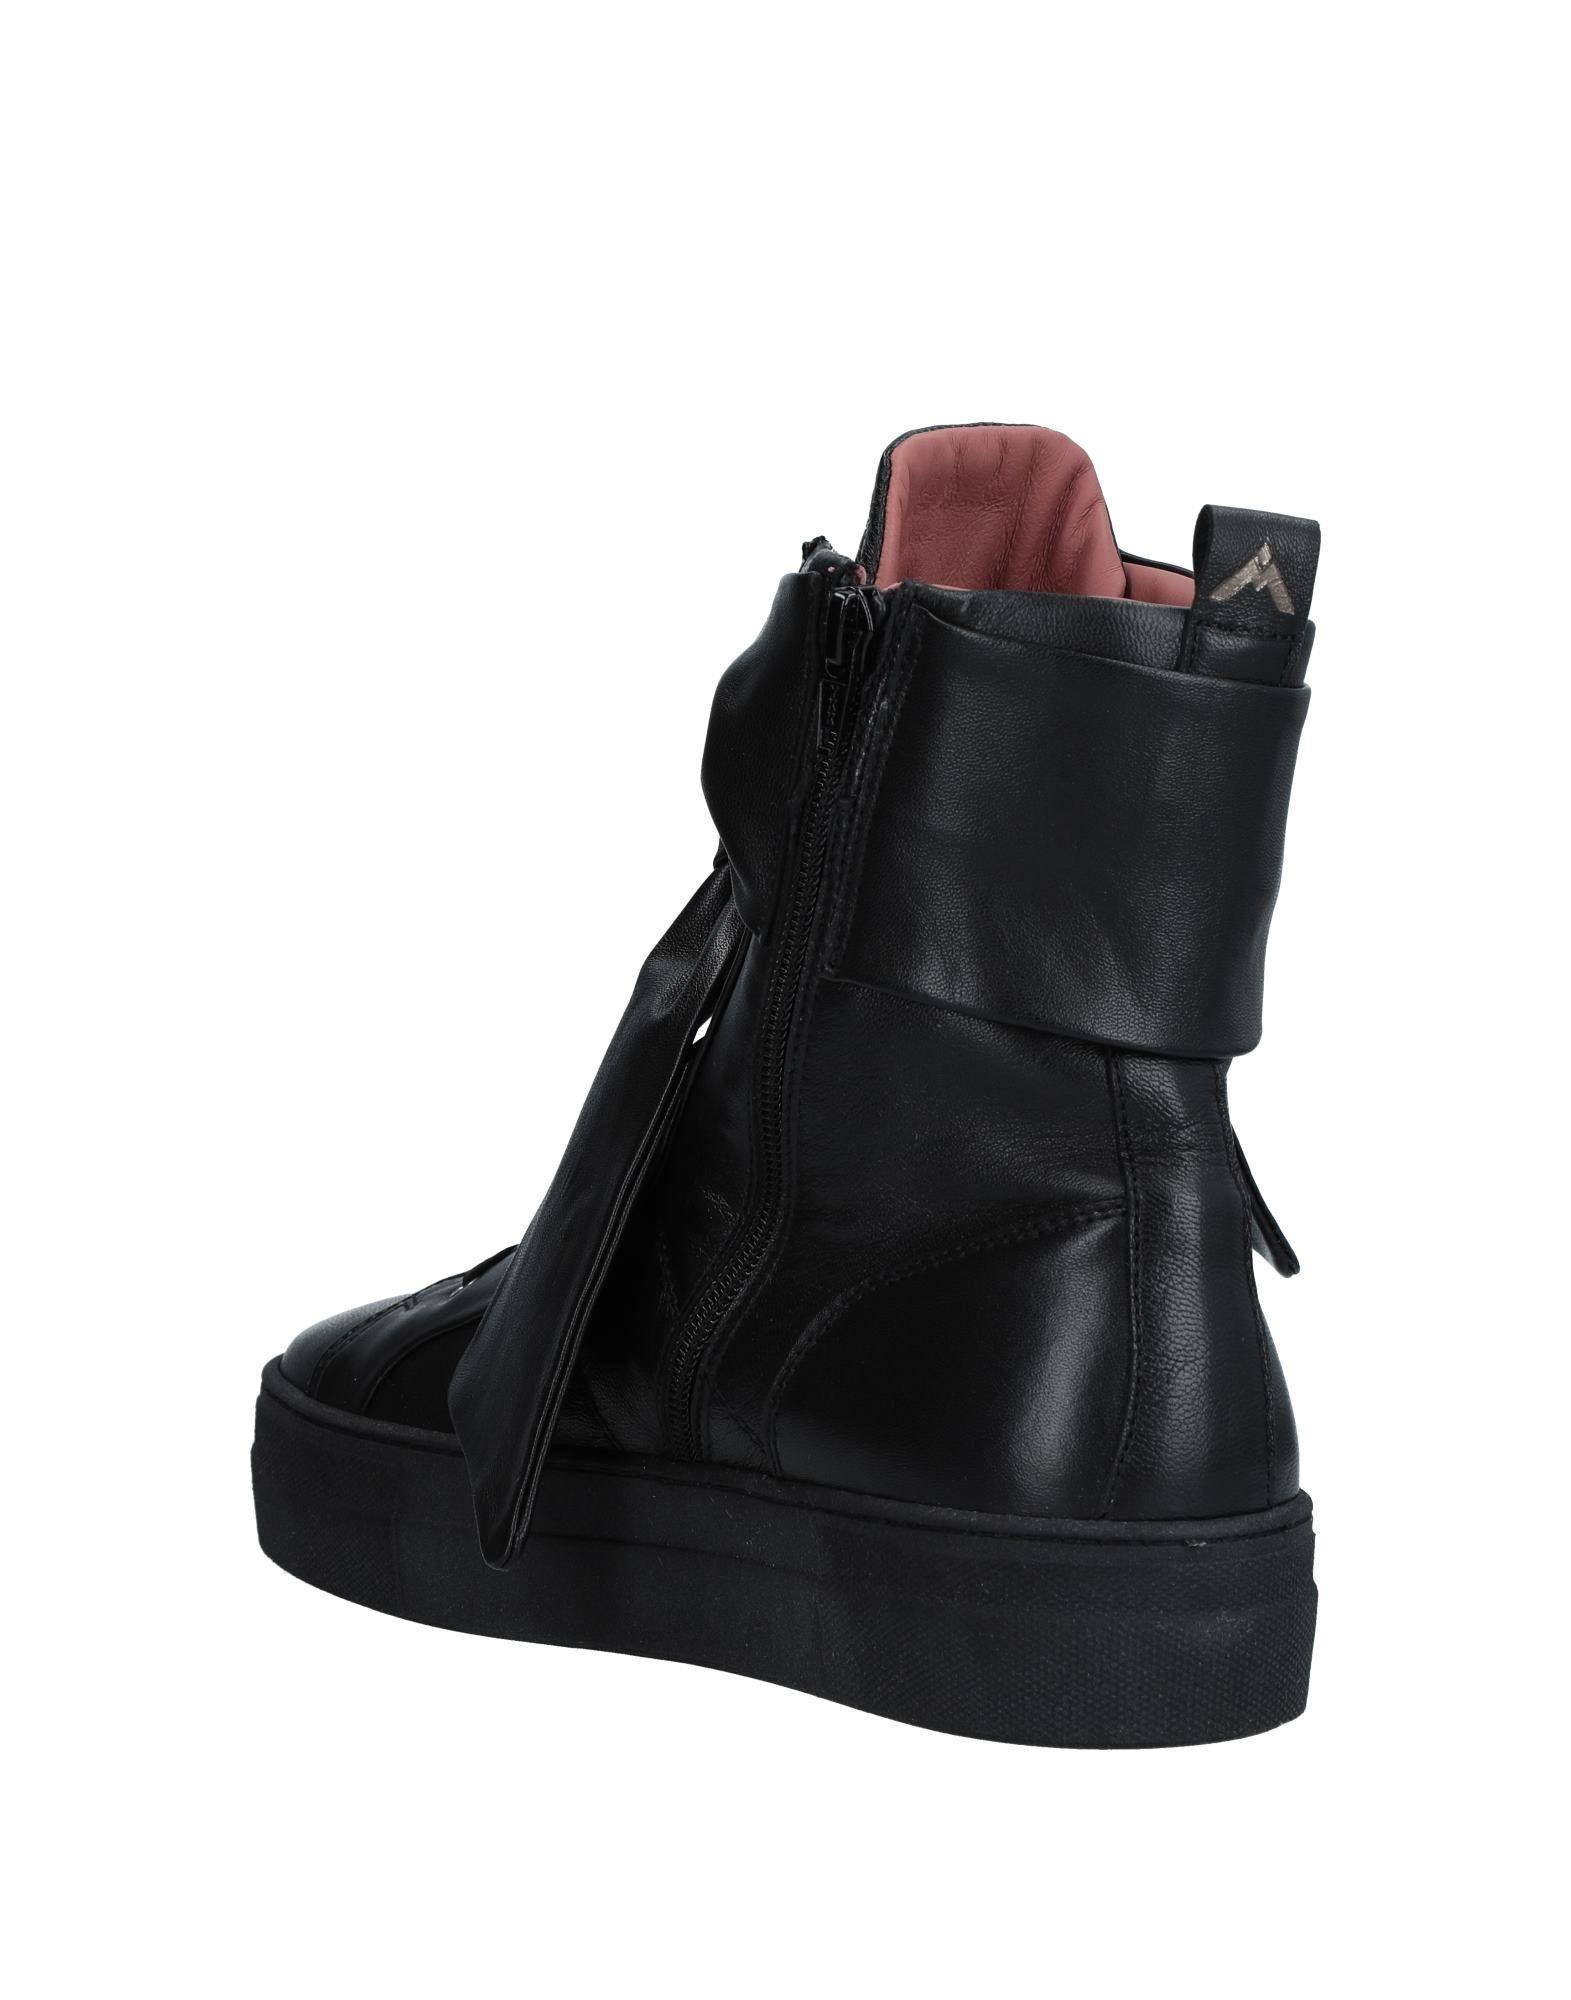 Andrea Morelli Morelli Morelli Sneakers Damen  11540607AT Gute Qualität beliebte Schuhe e68247